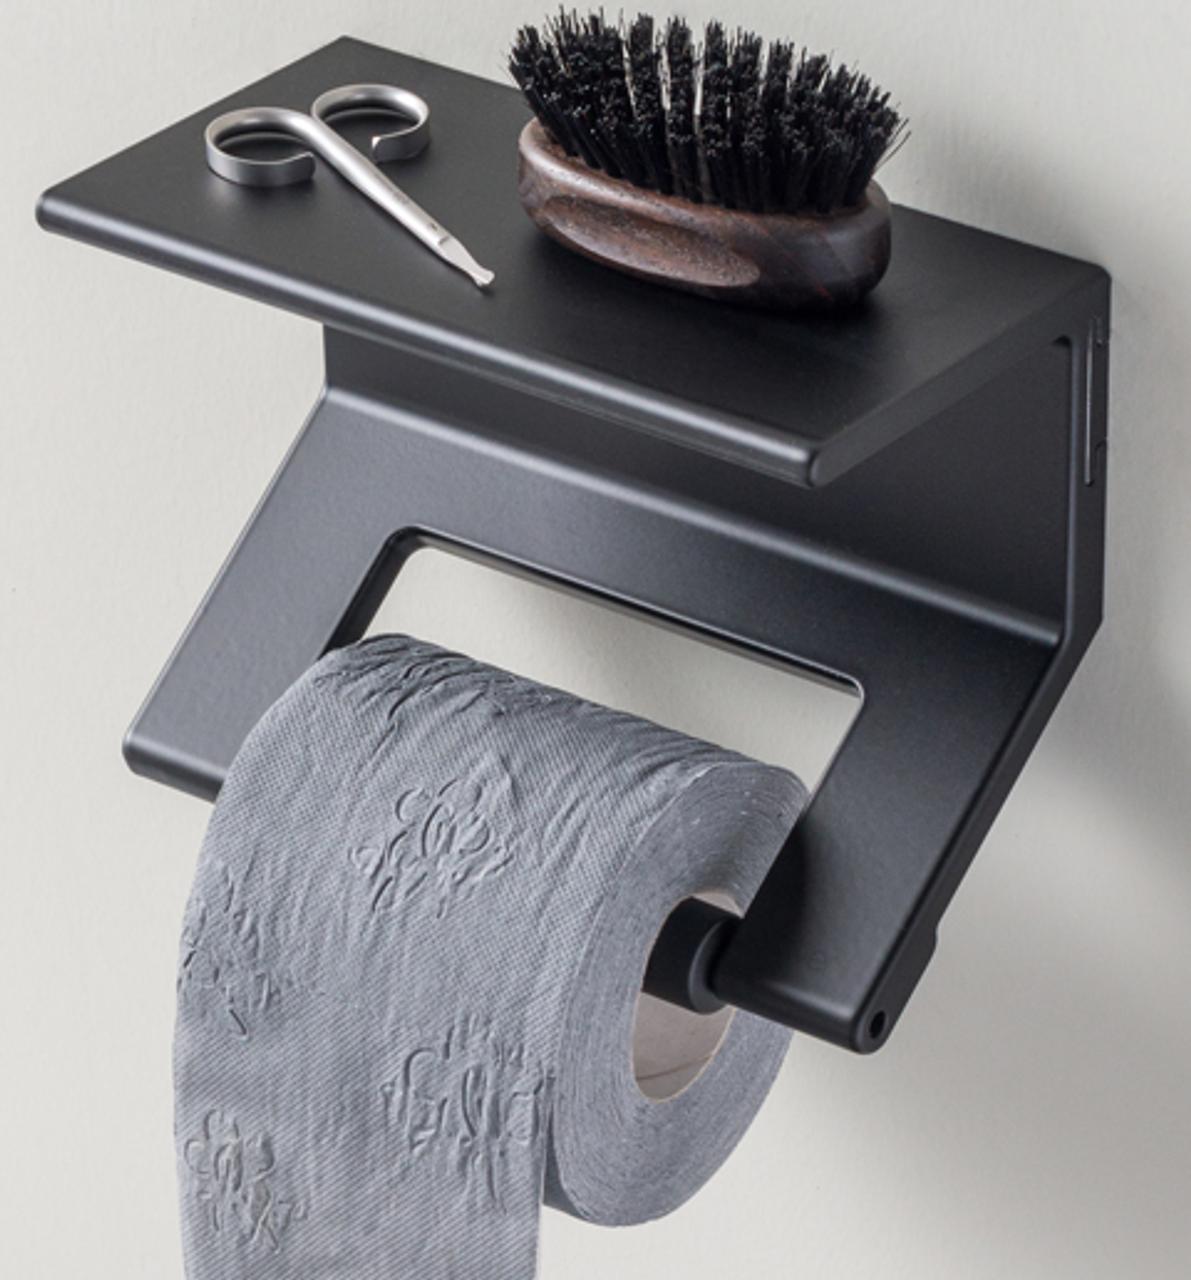 Duality™ Black Hybrid™ Toilet Roll Holder with Shelf